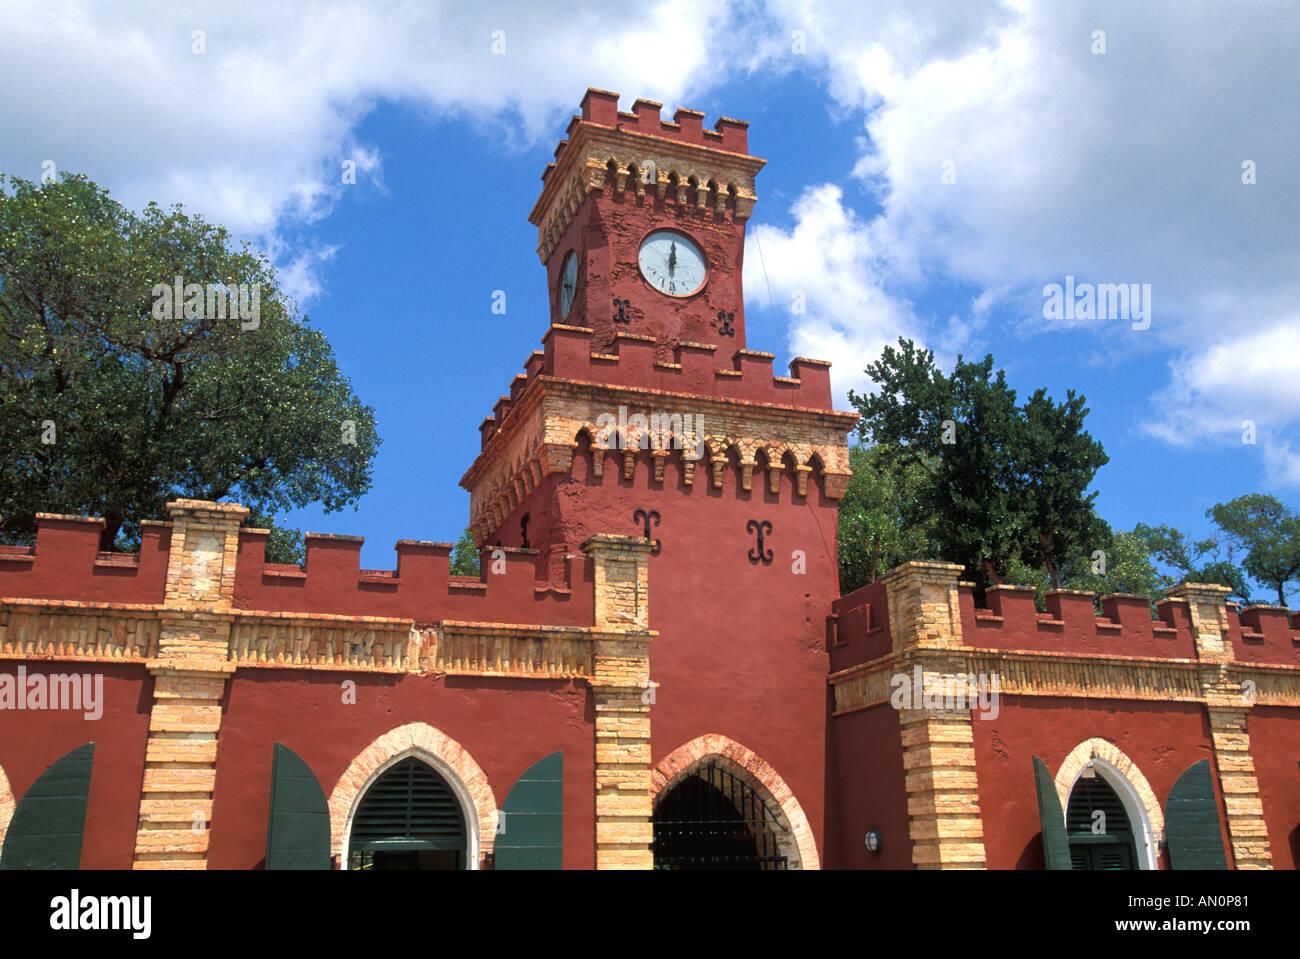 Fort Christian red walls clocktower St Thomas US Virgin Islands Charlotte Amalie historic landmark tourist attraction - Stock Image